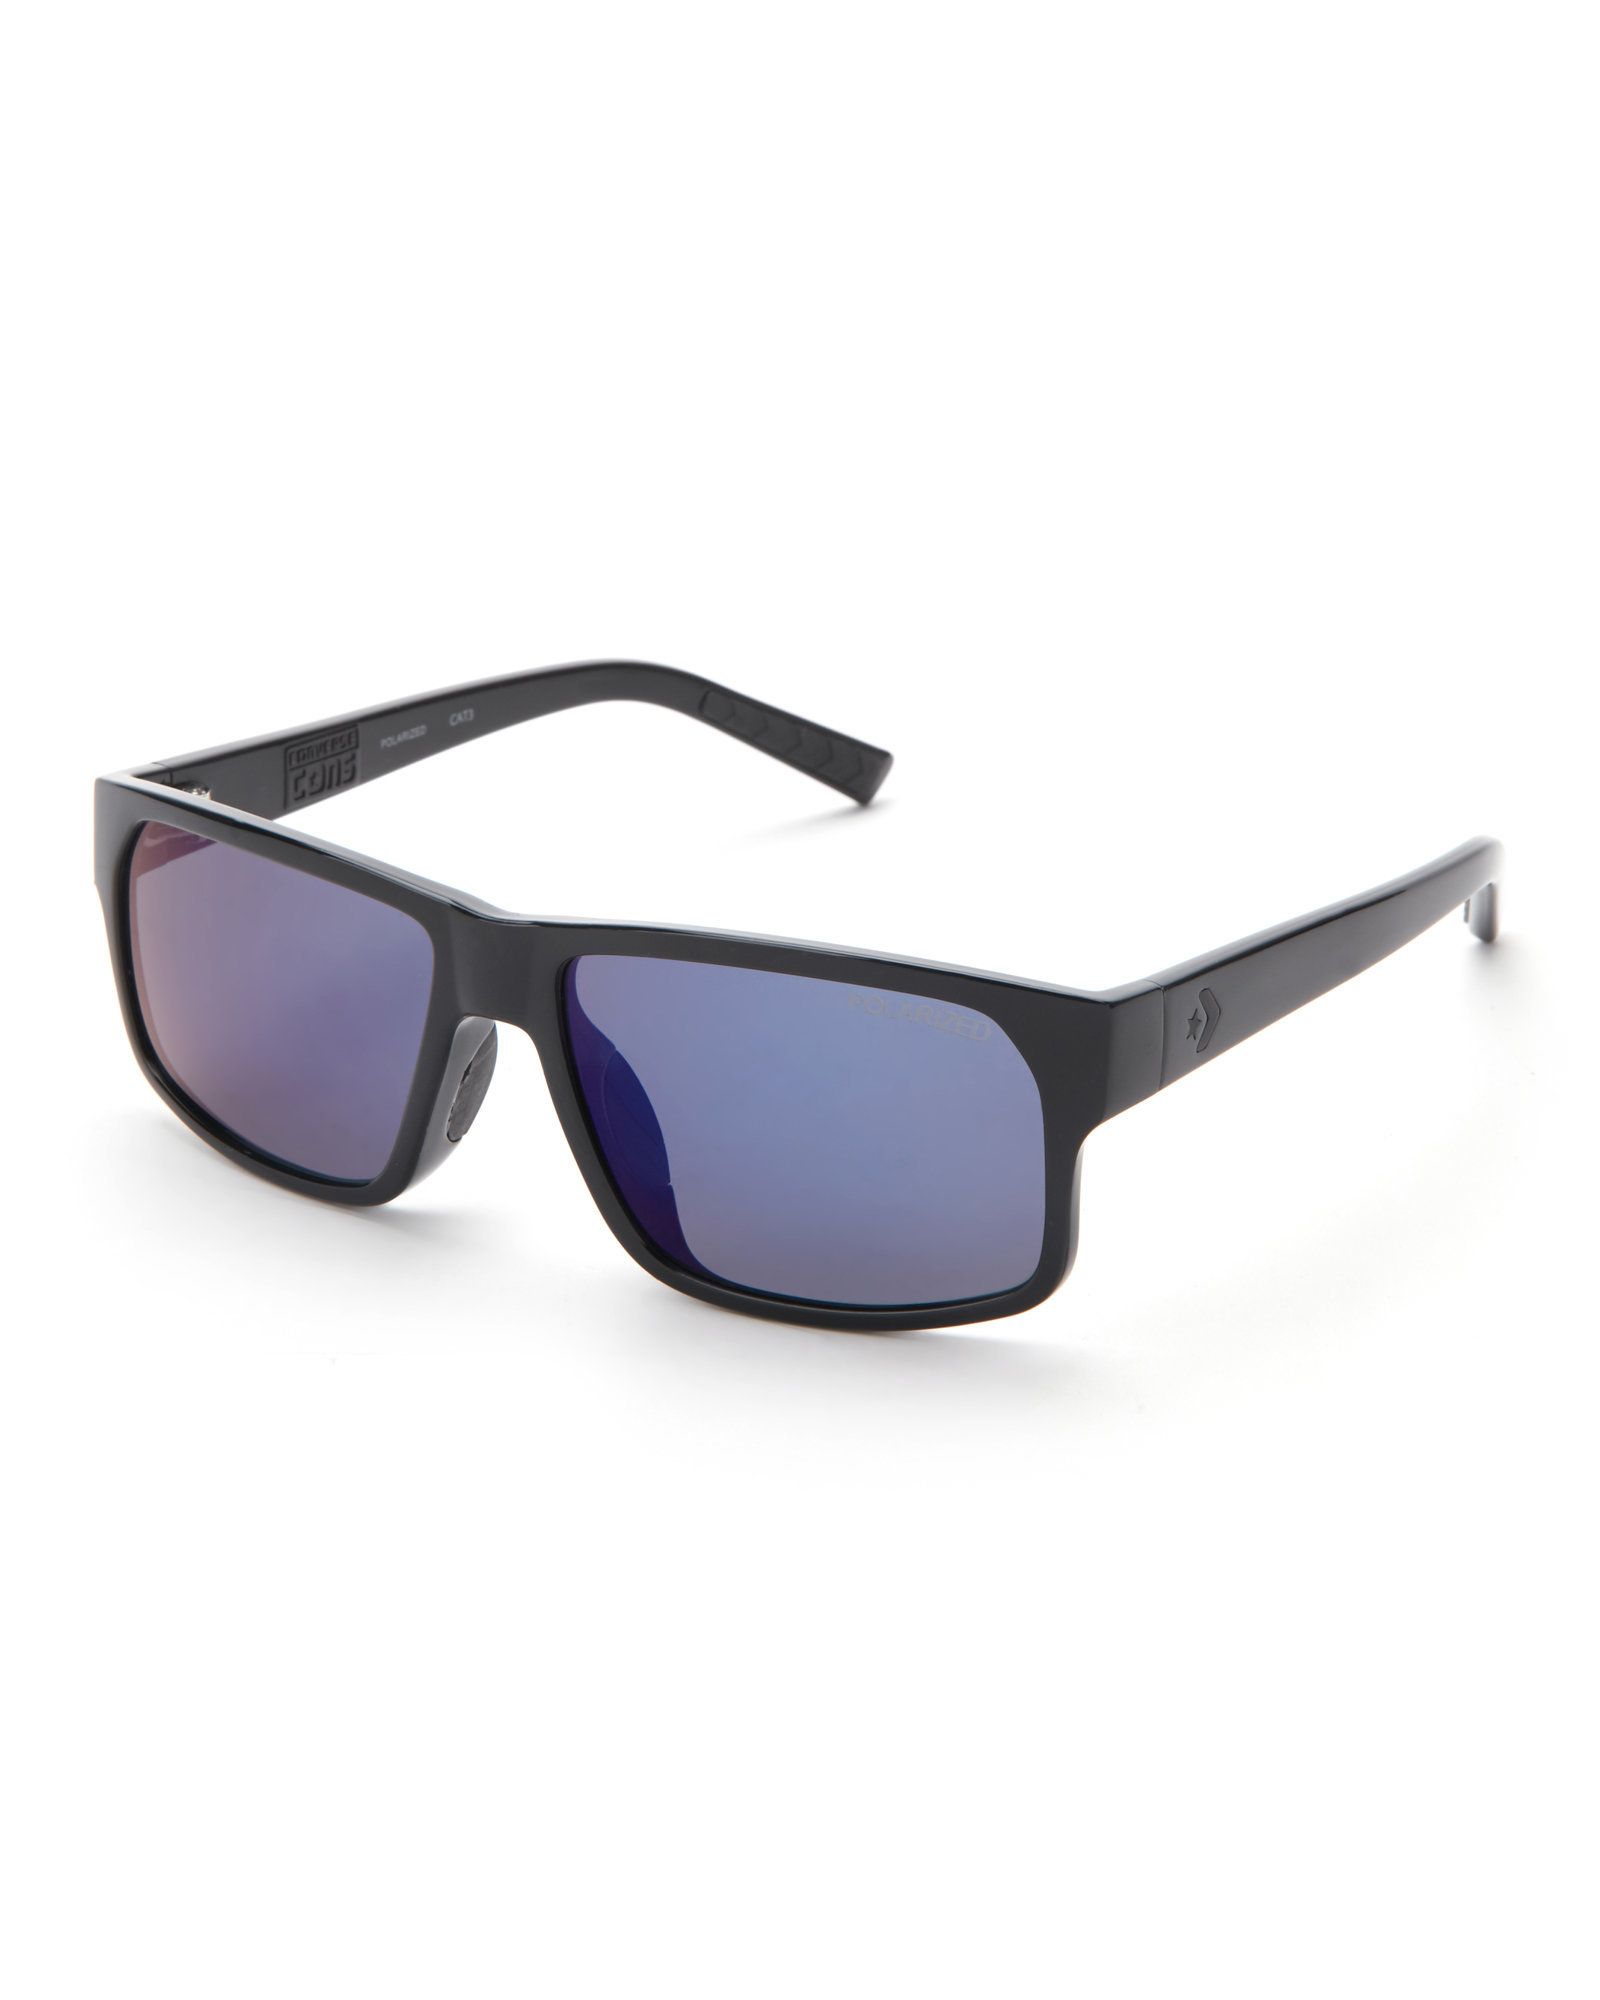 0b3c9485ac61e Lyst - Converse Black R001 Rectangle Sunglasses in Black for Men